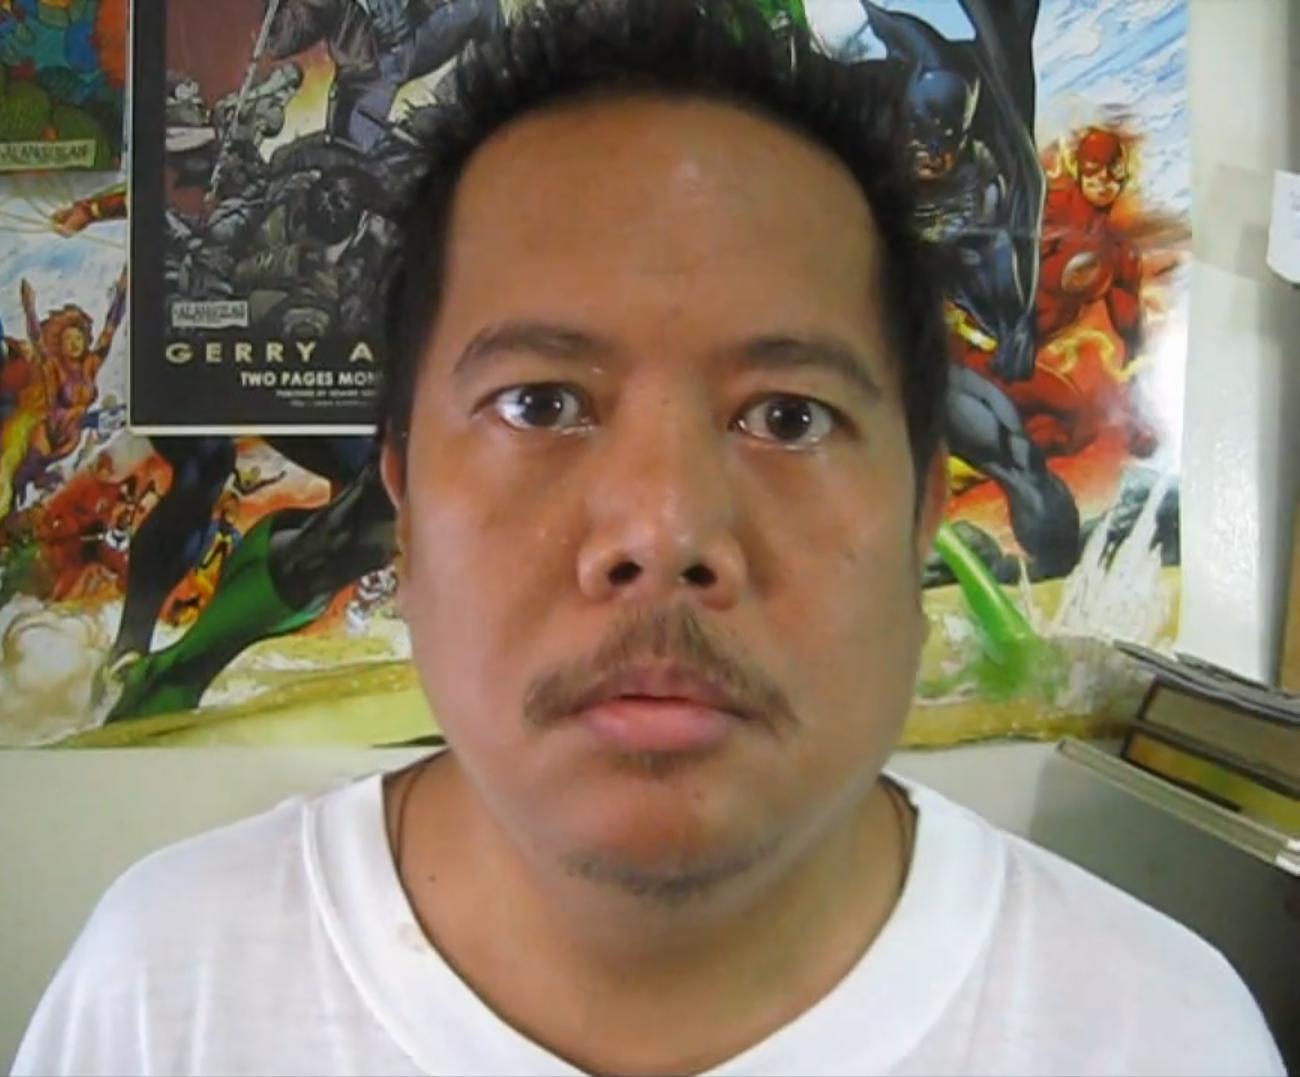 Alanguilan in 2011